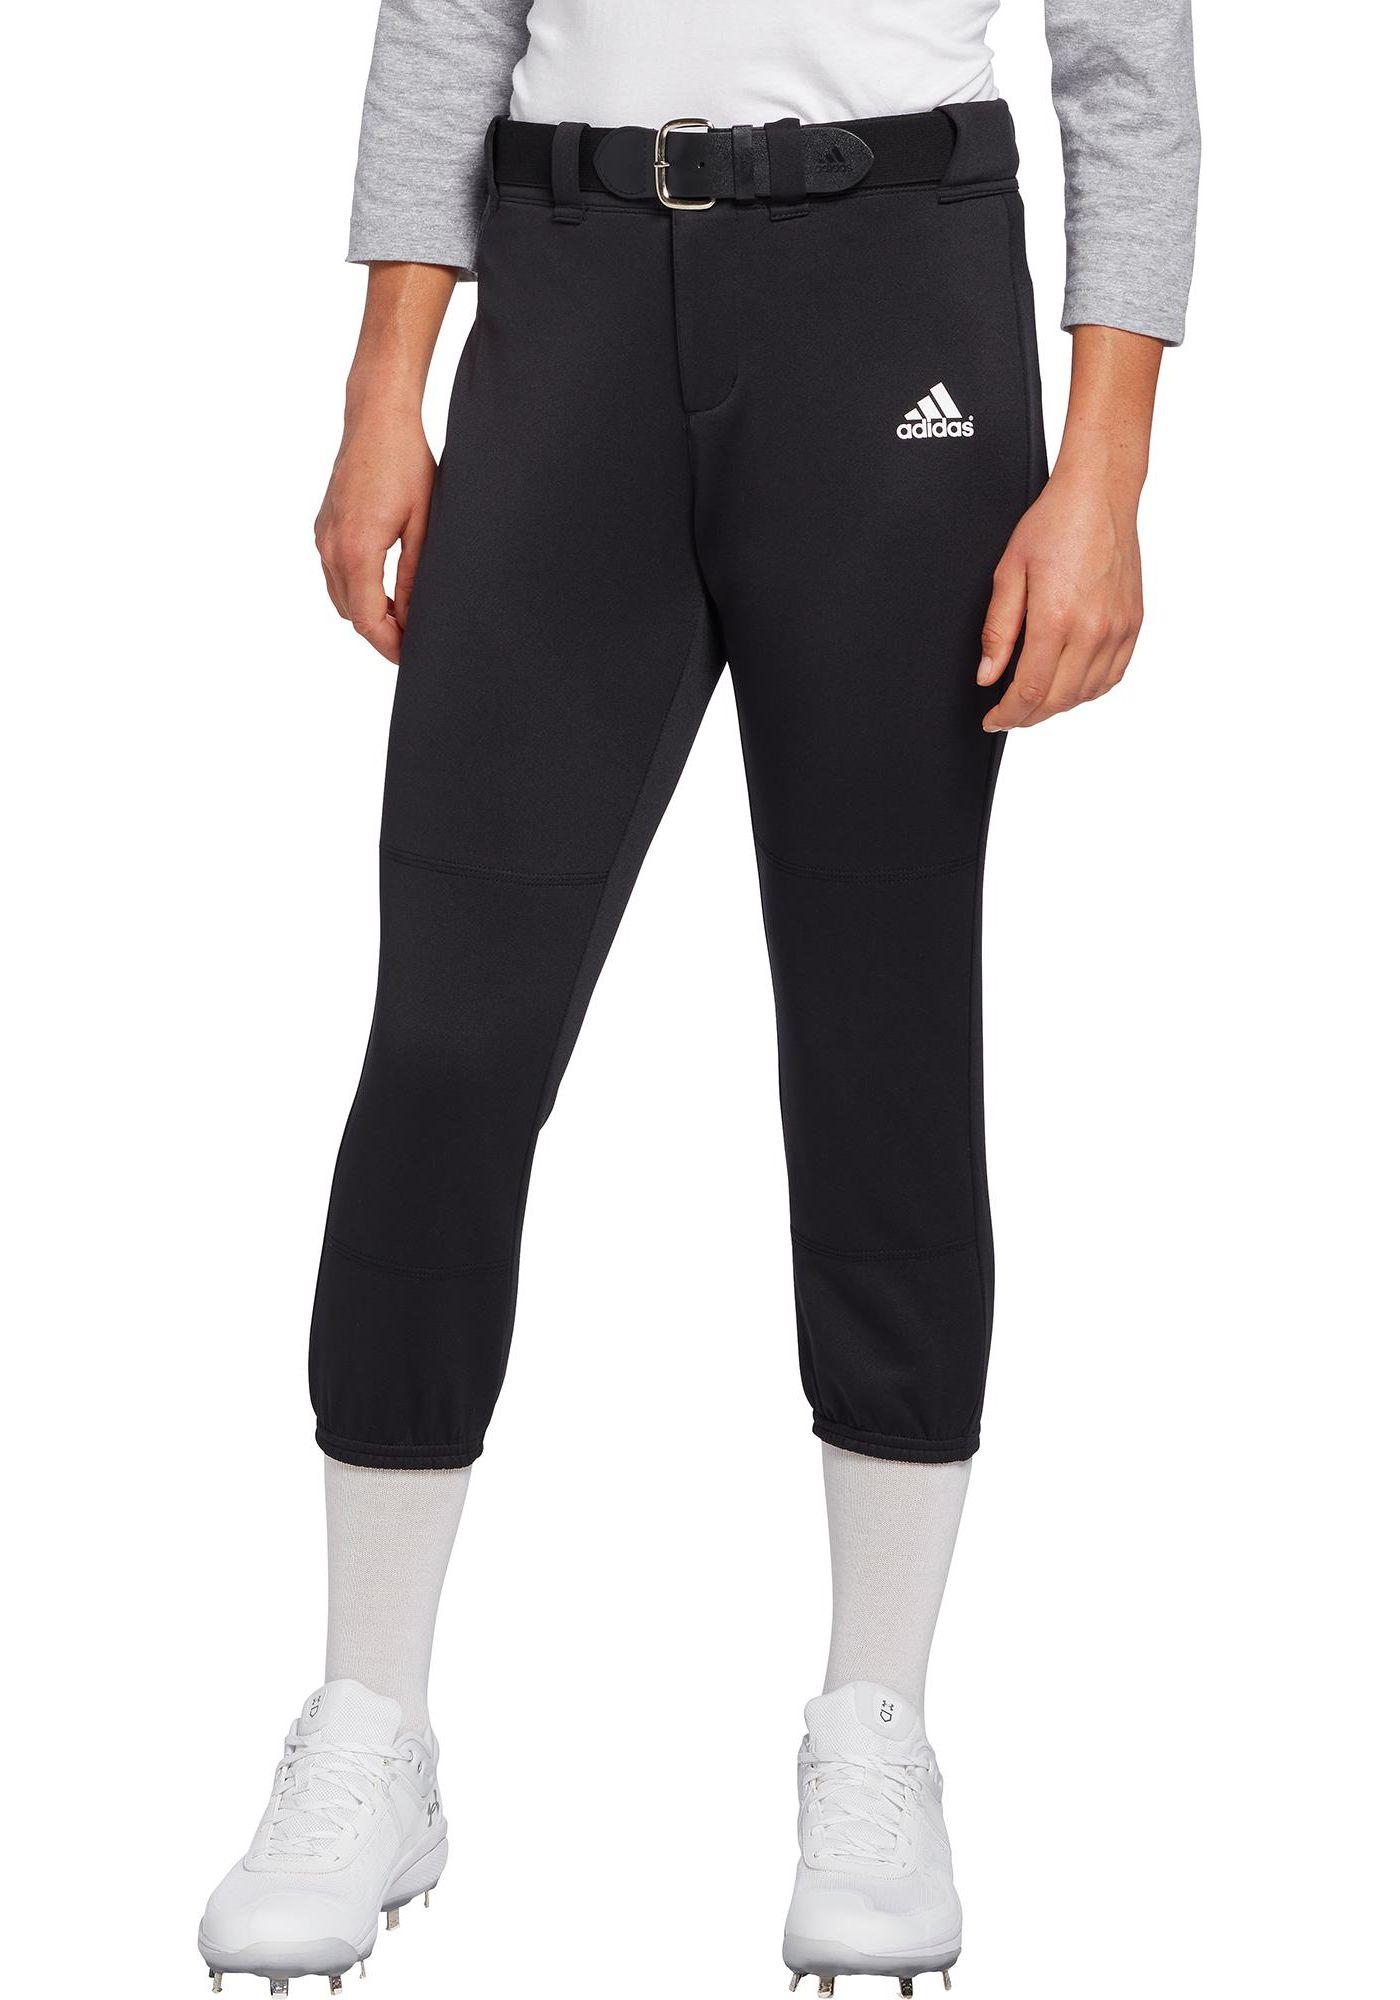 adidas Women's Softball Pants